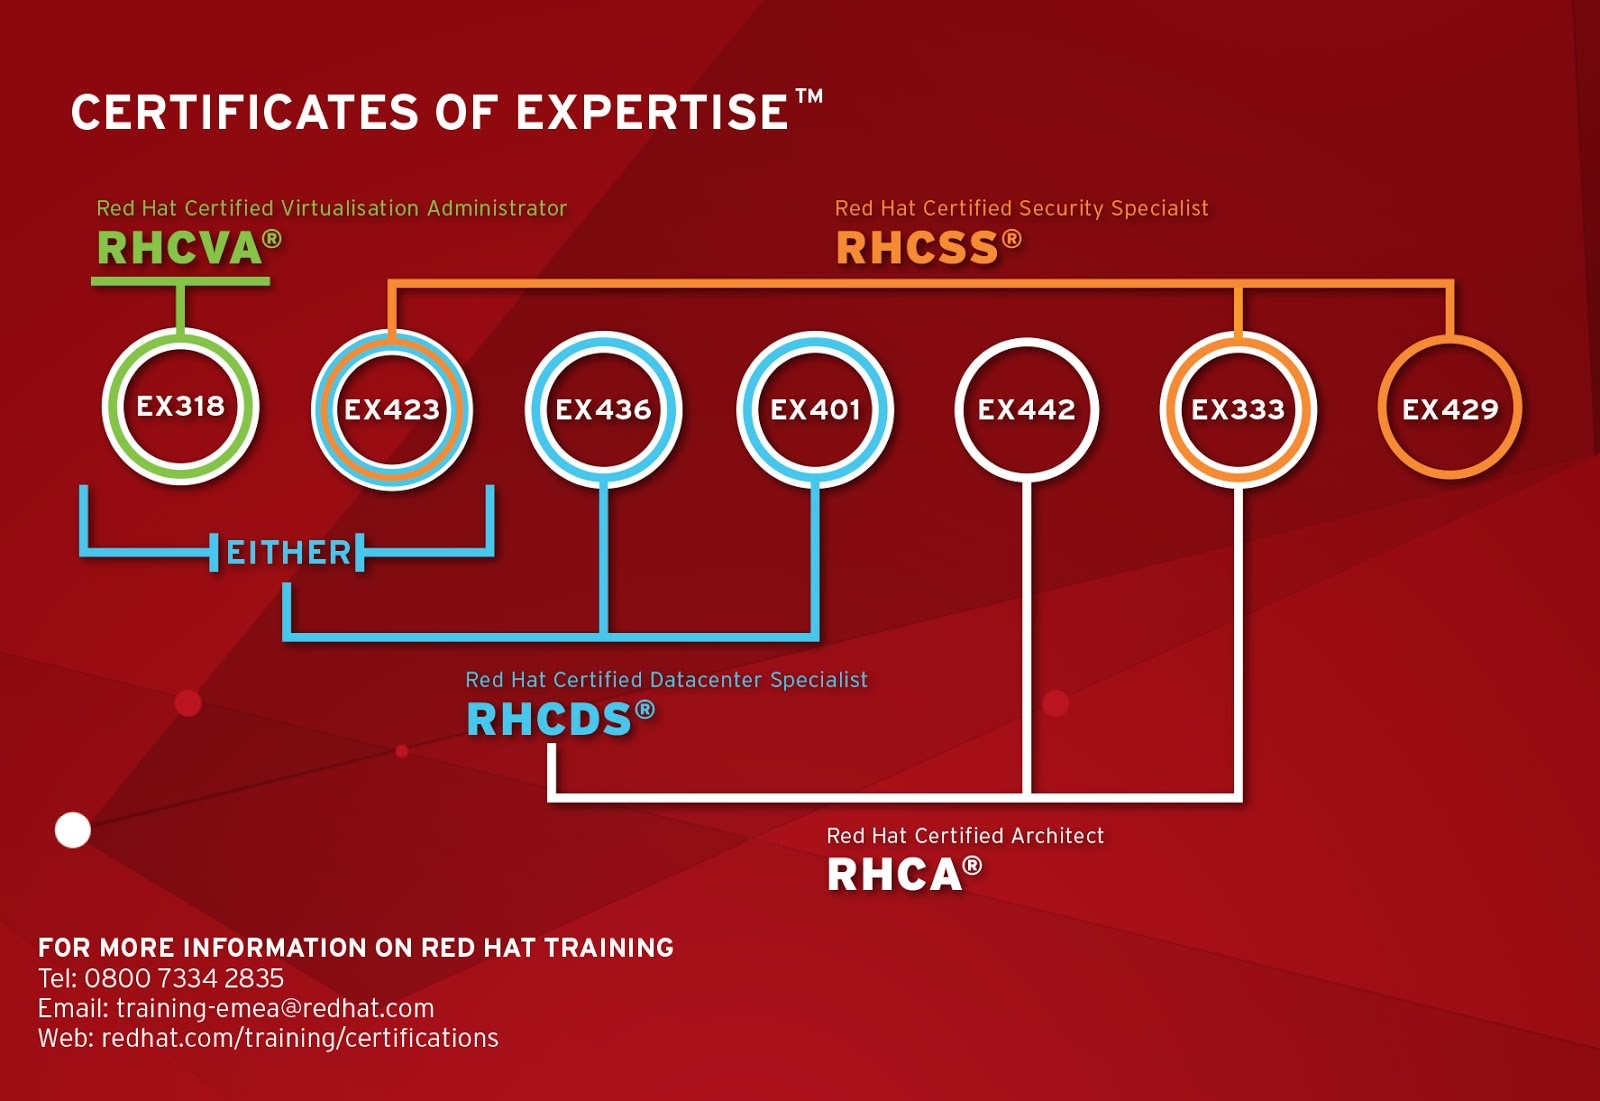 hat ctu certifications training rhel partnership obsidian read solutions